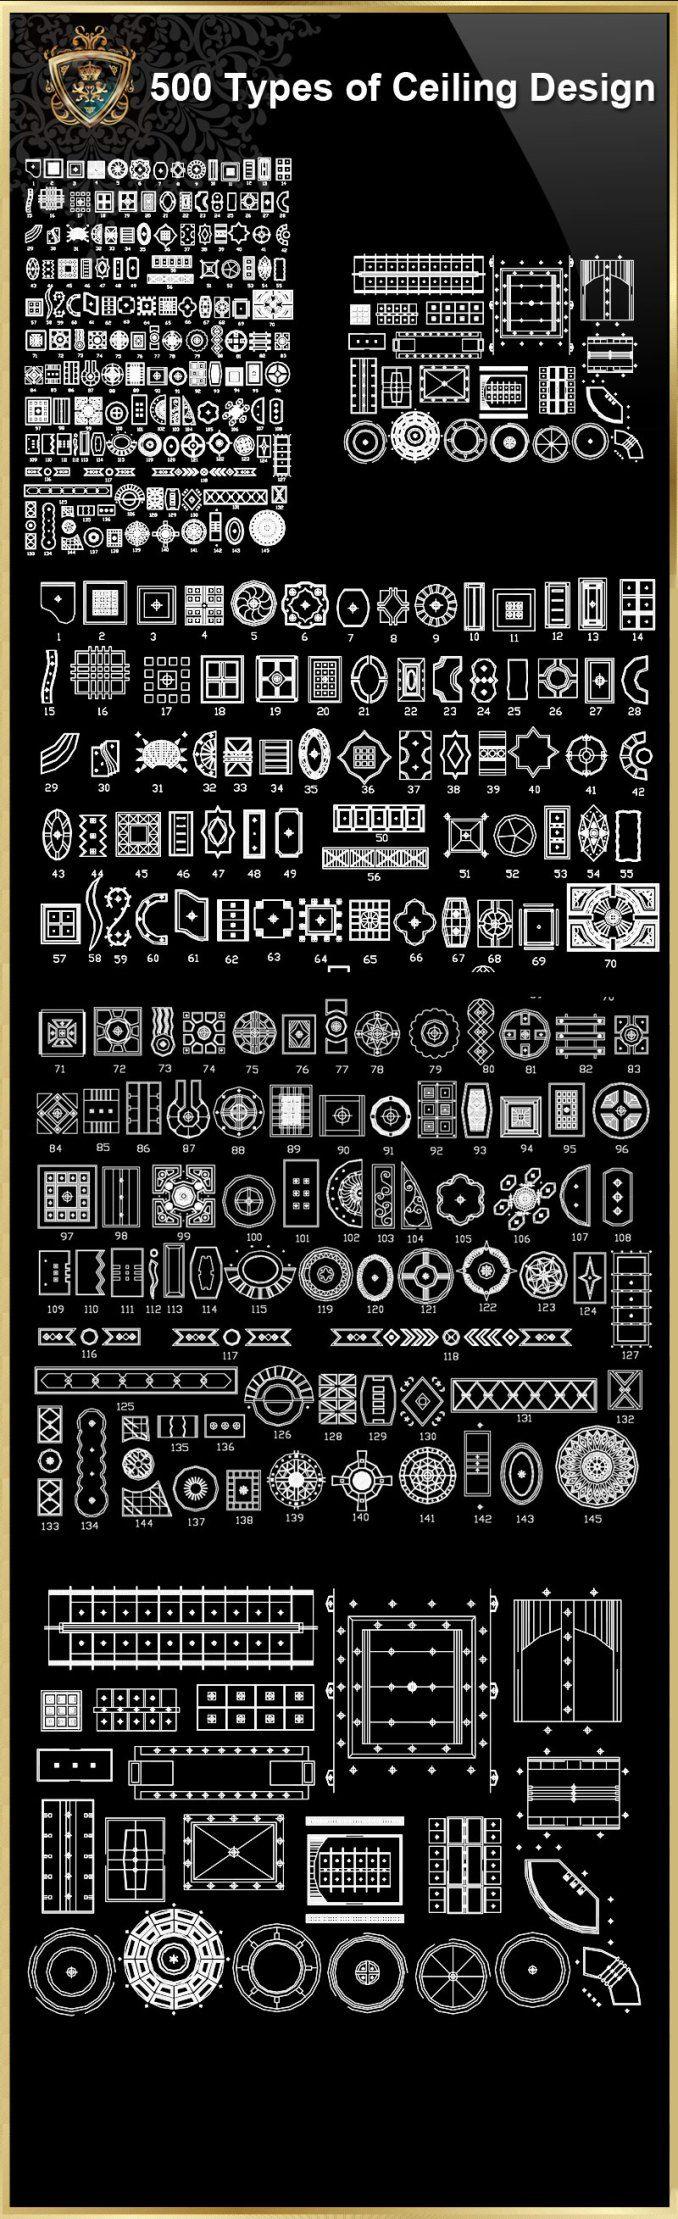 【115 Best Interior Design CAD Details 】 (Best Recommand!!)   Free